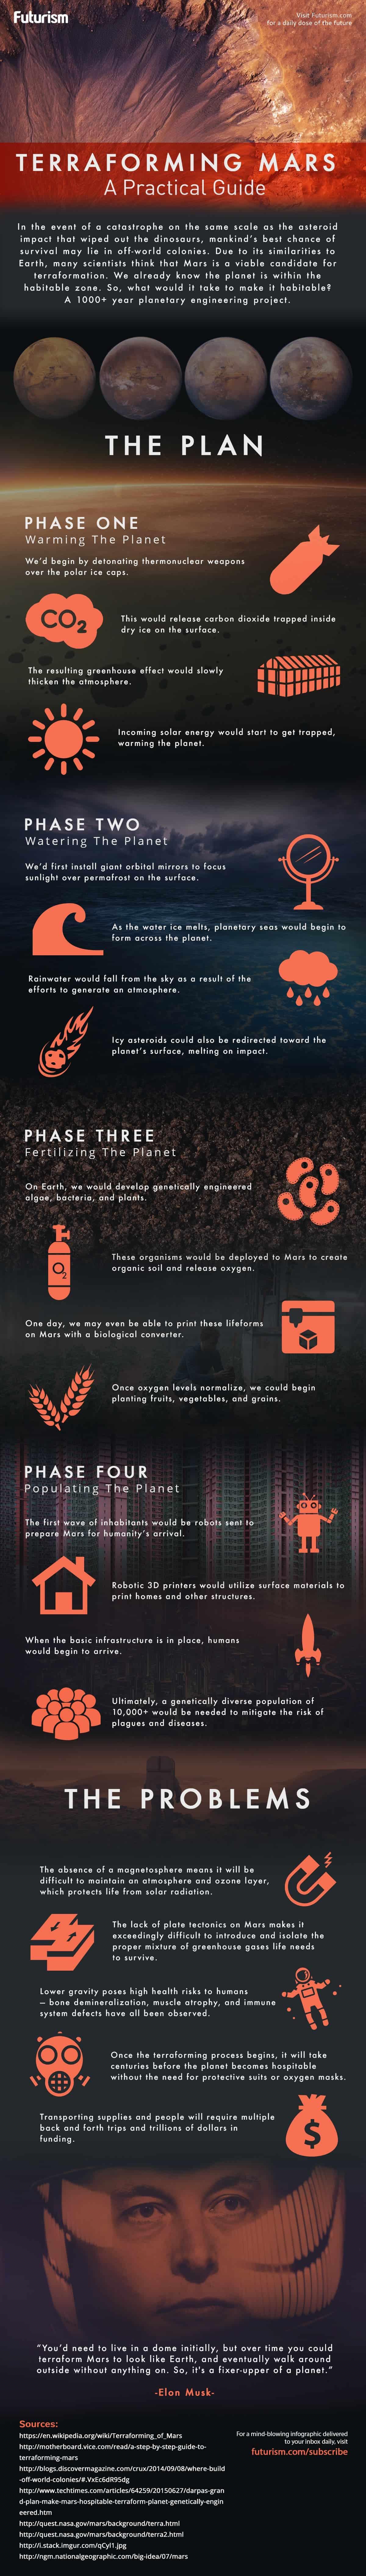 mars terraforming infographic